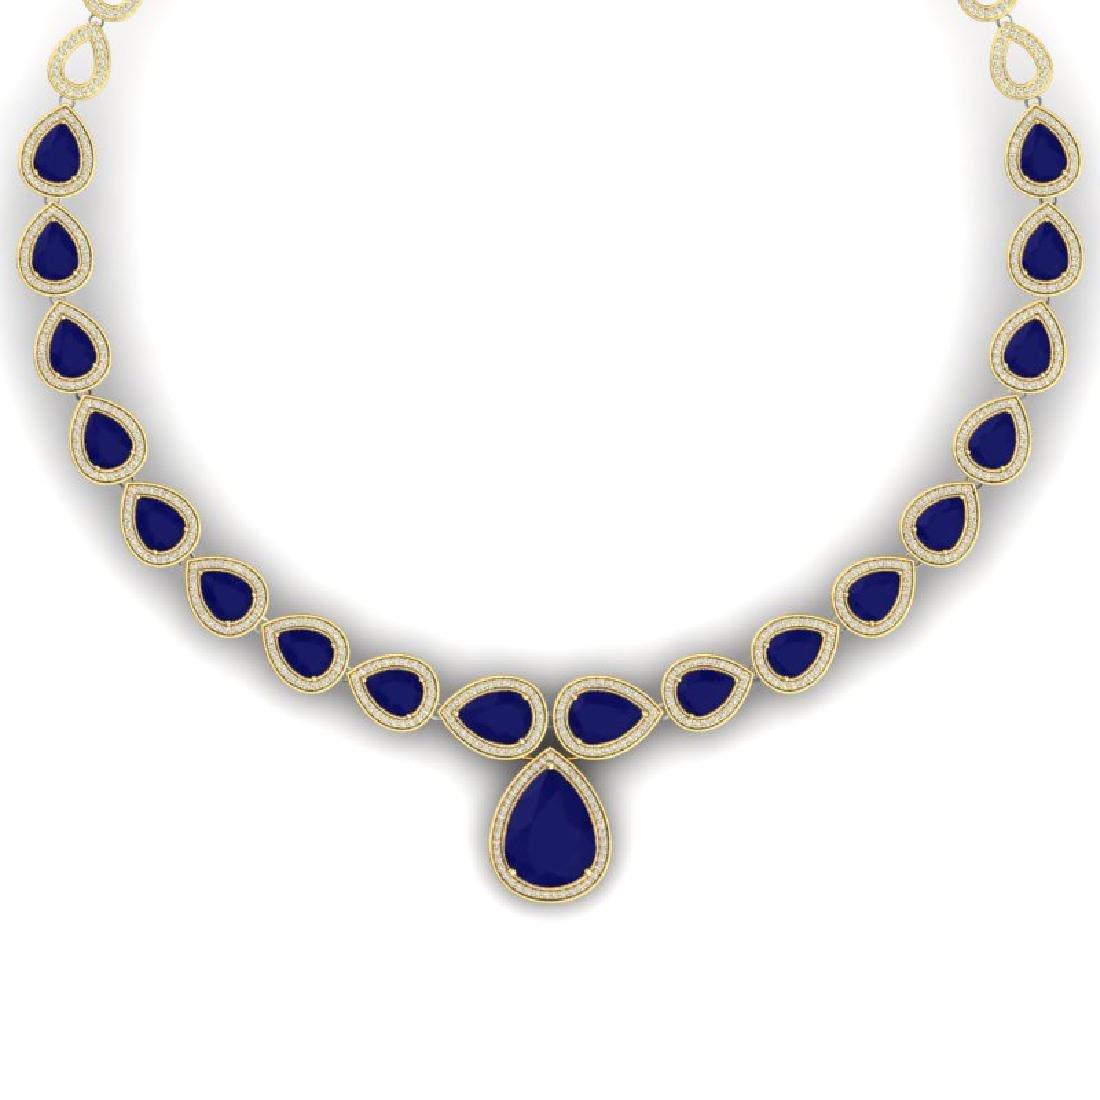 51.41 CTW Royalty Sapphire & VS Diamond Necklace 18K